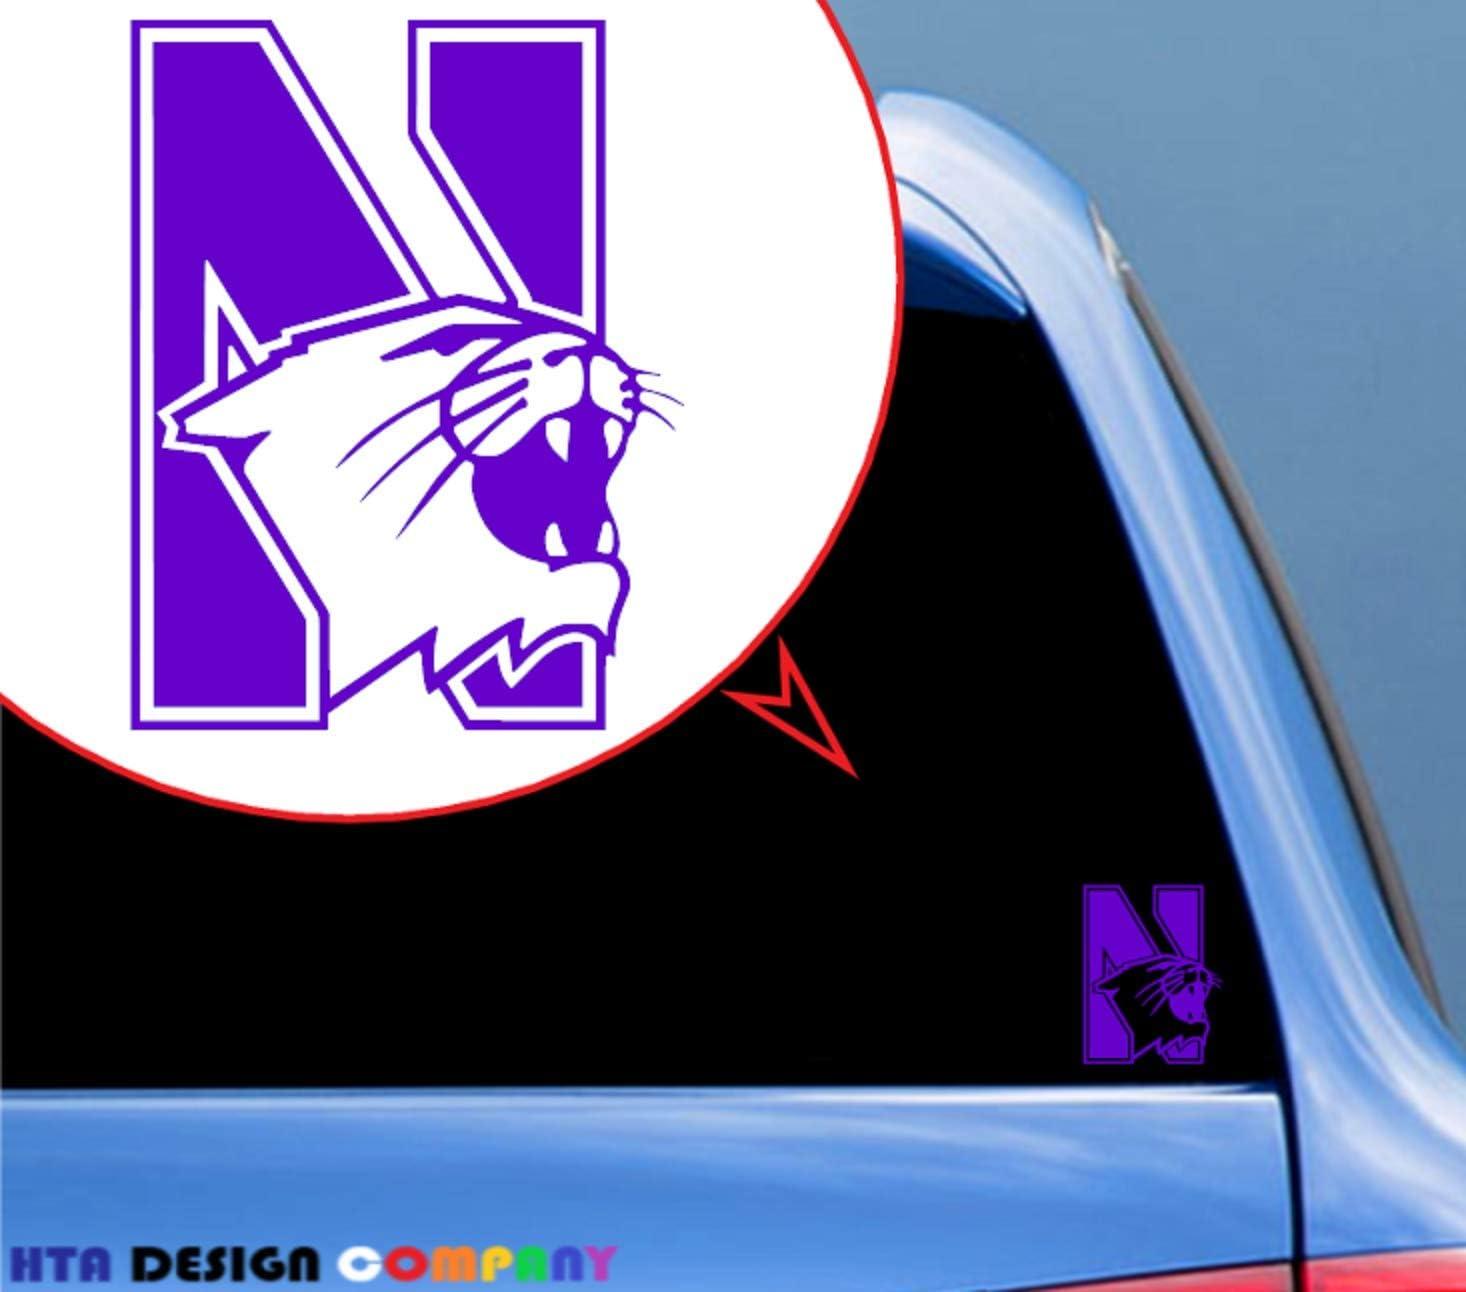 HTA Custom Decals Northwestern University Wildcats/Vinyl Transfer Sticker Decal for Car/Truck/Jeep/Window/Bumper/Laptop/Phone Decor/Home Decoration/Motorcycle(4 in x 5 in) - Purple